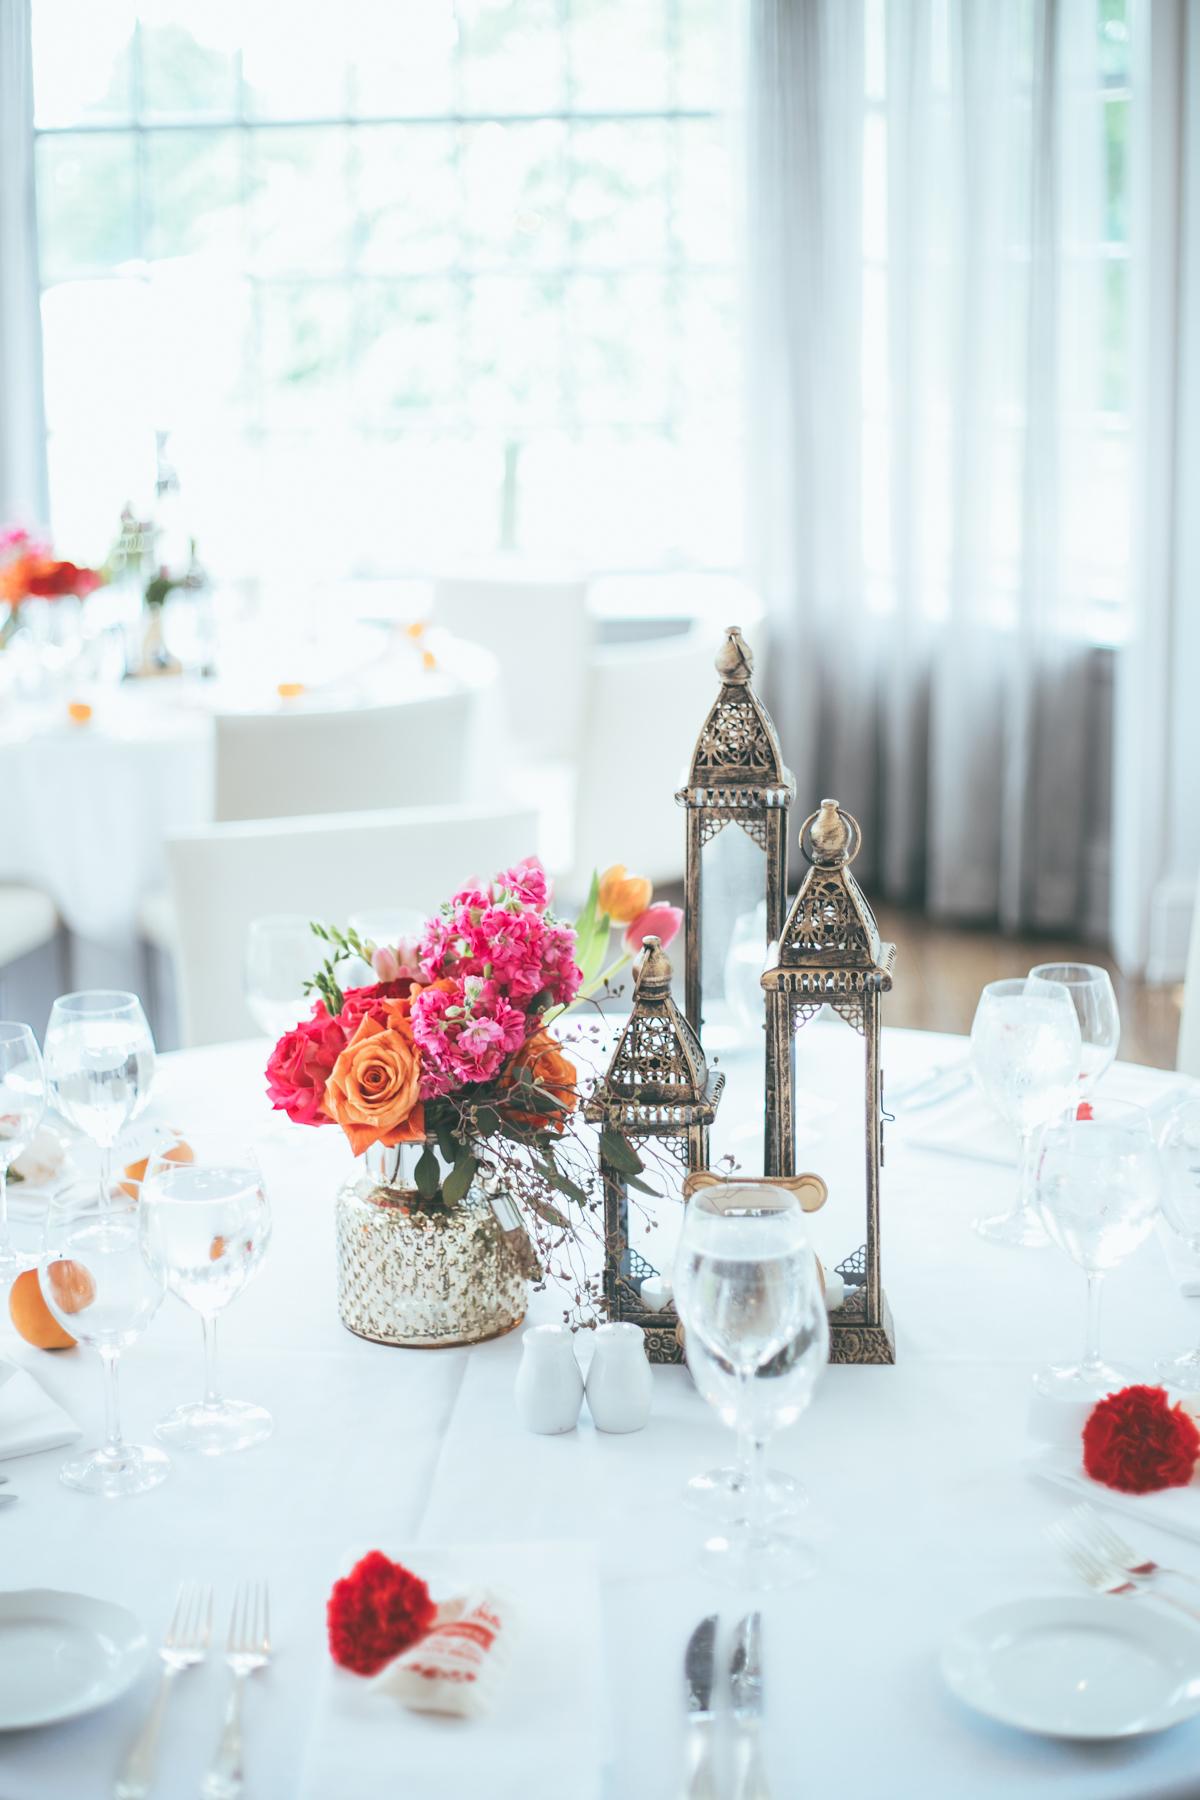 Indian Garden Wedding - The Love Studio103.jpg